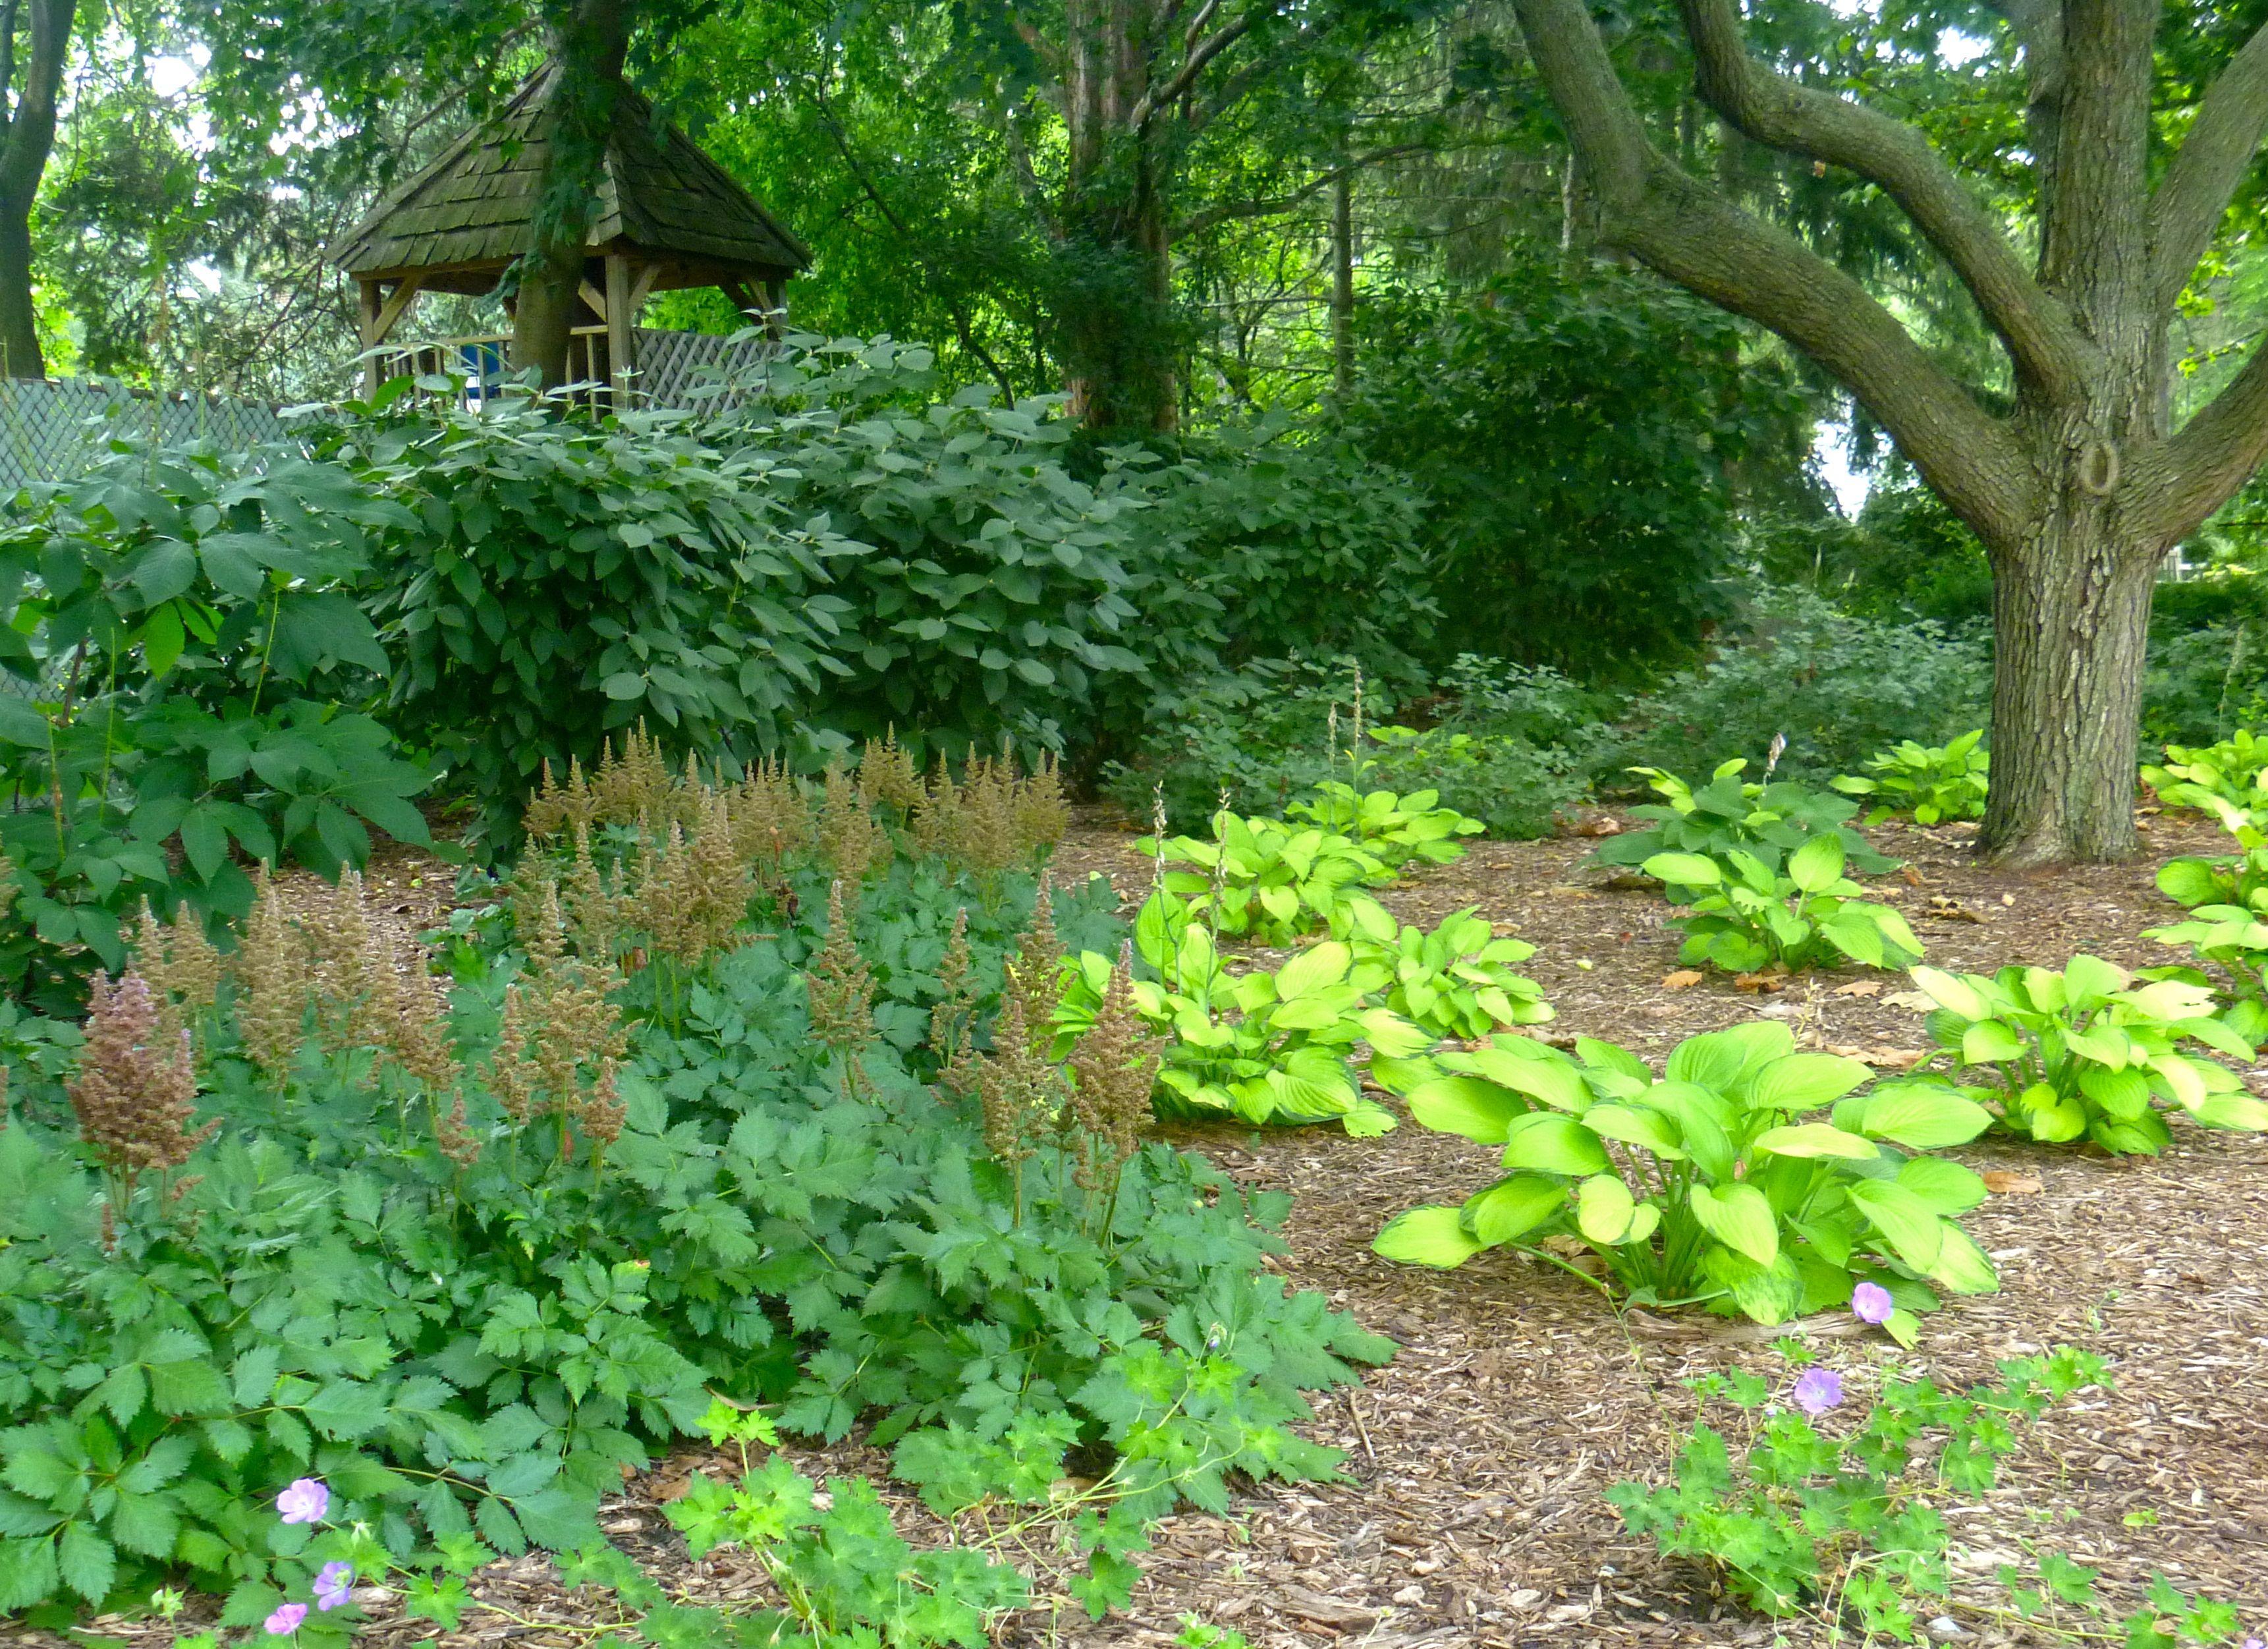 Shade garden, hosta and astilbe. Lombard, IL | Land Art Design ... on hosta and daylily garden, hosta and hydrangea garden, hosta and caladium garden, hosta garden plans blueprints,